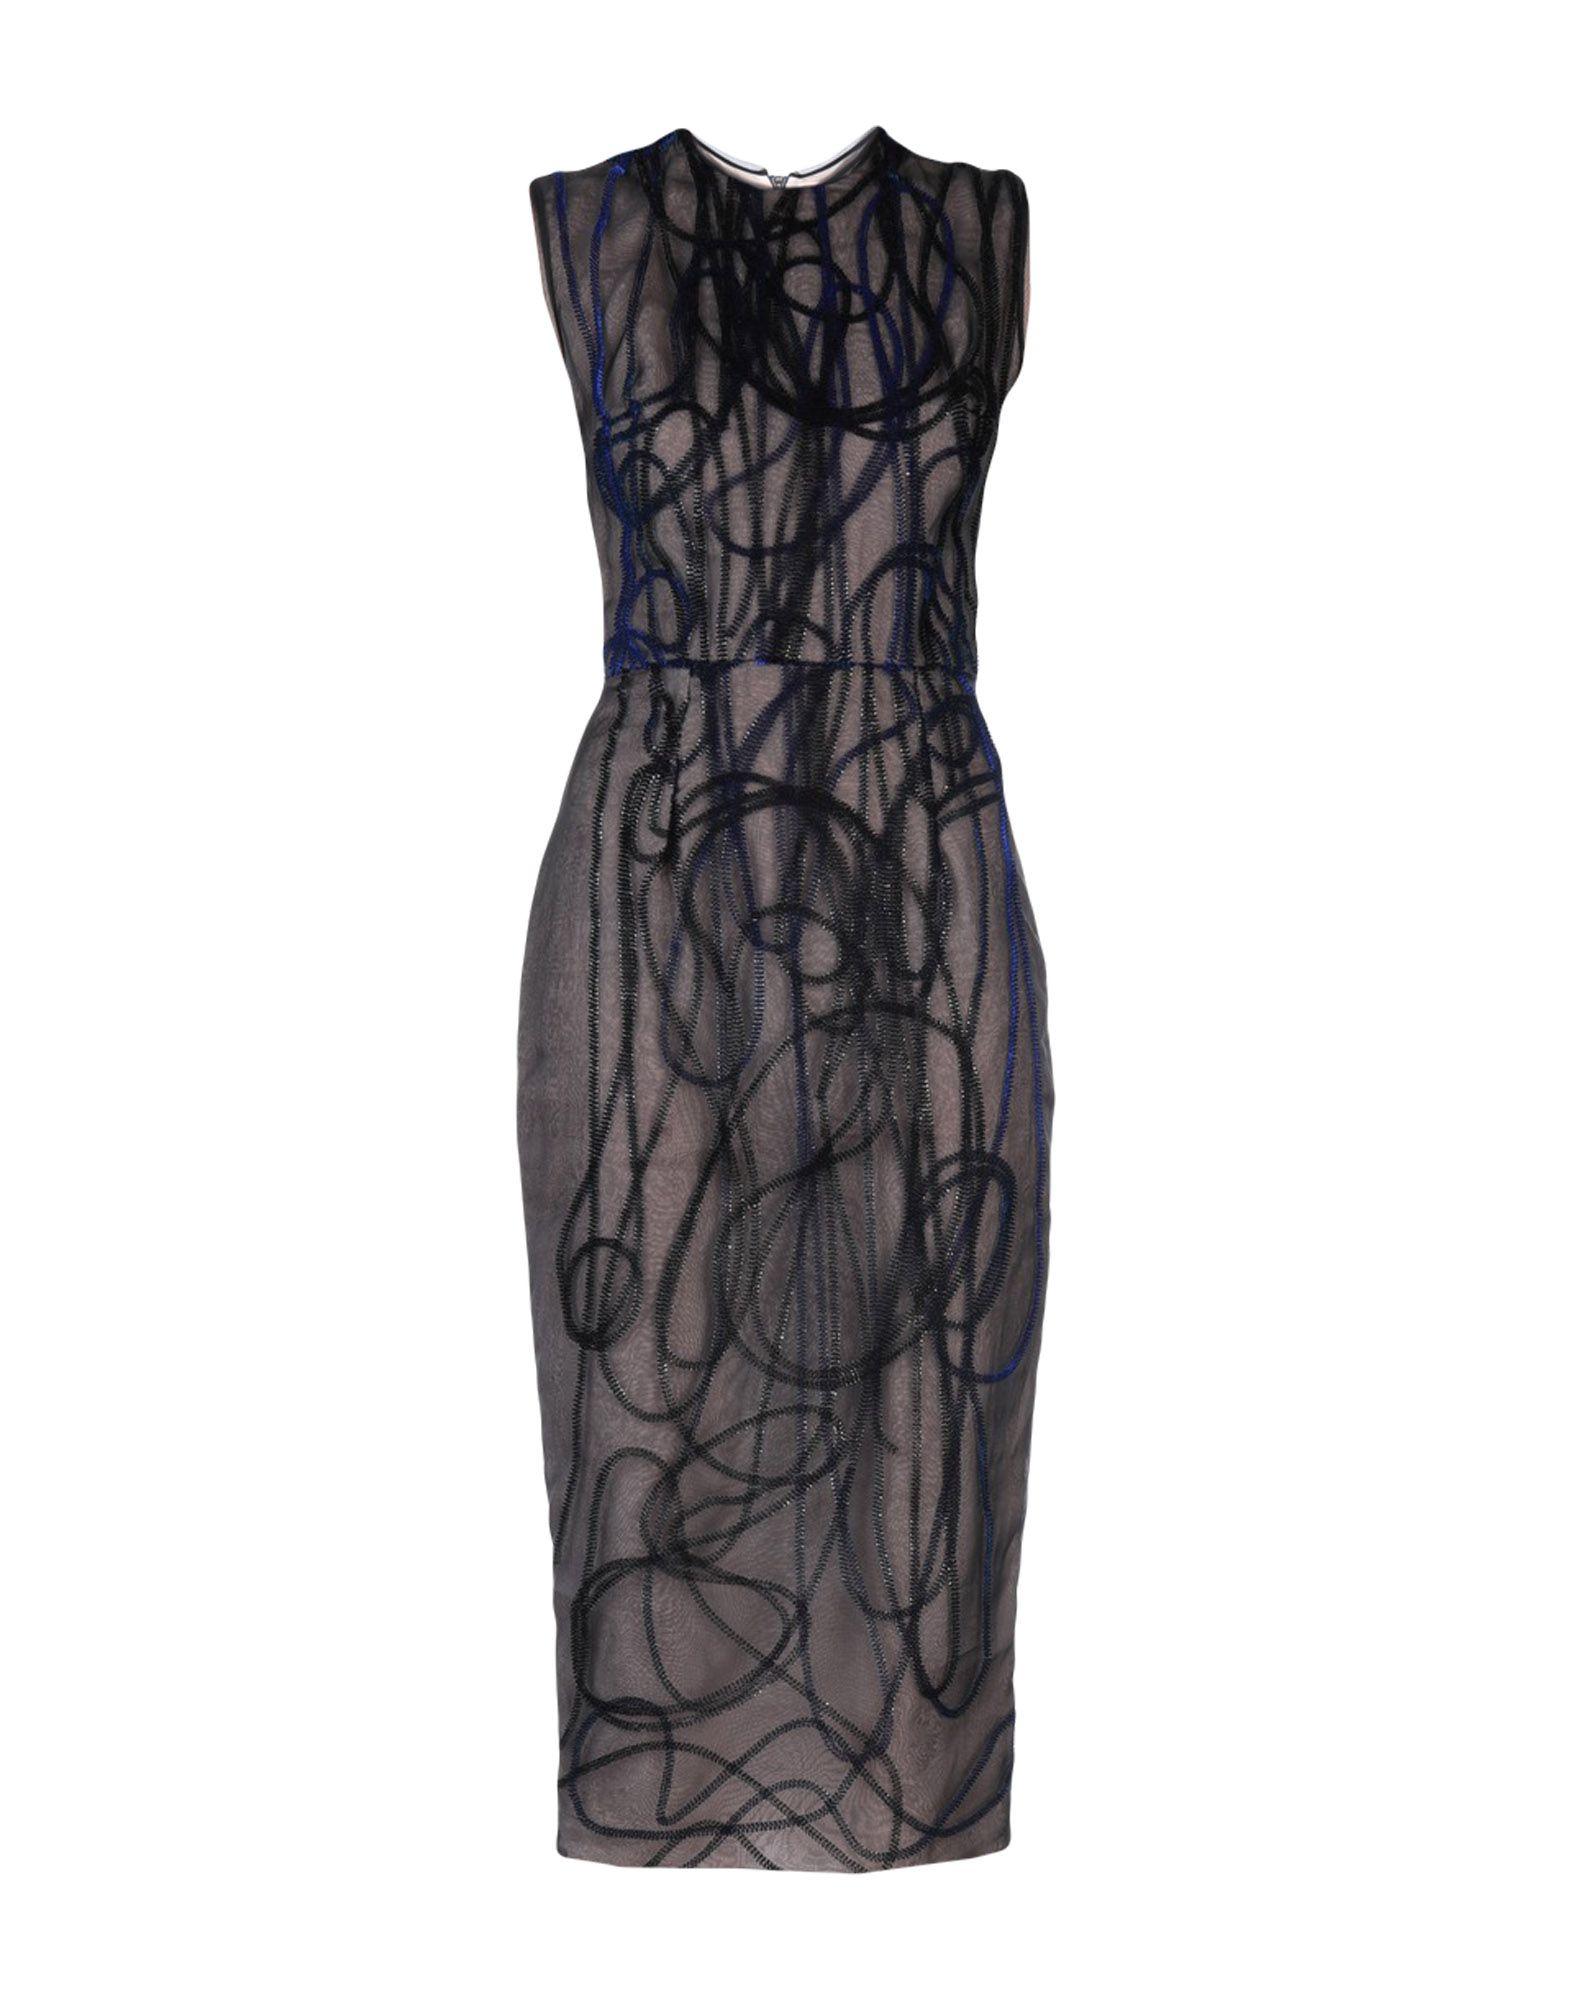 ROKSANDA Платье длиной 3/4 carbon fiber front bumper lip splitter spoiler for bmw 3 series gt f34 m sport bumper 4 door 14 17 grey frp 2pc 335i 340i gt